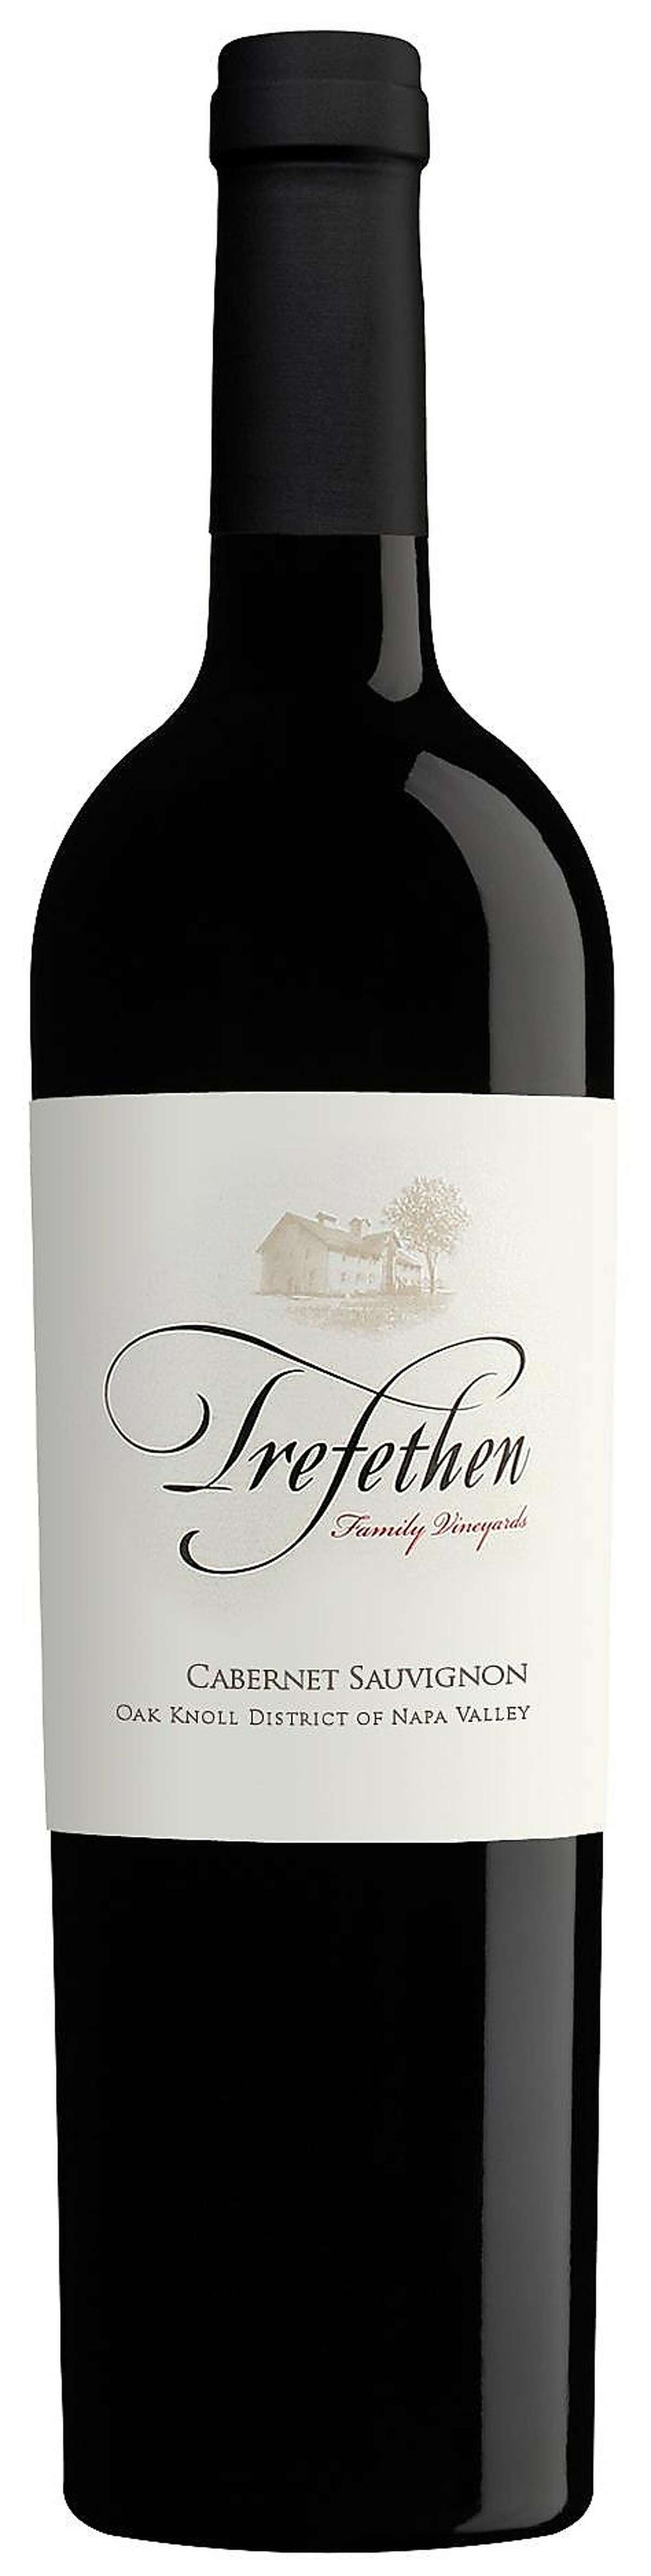 Trefethen Cabernet Sauvignon Oak Knoll District of Napa Valley